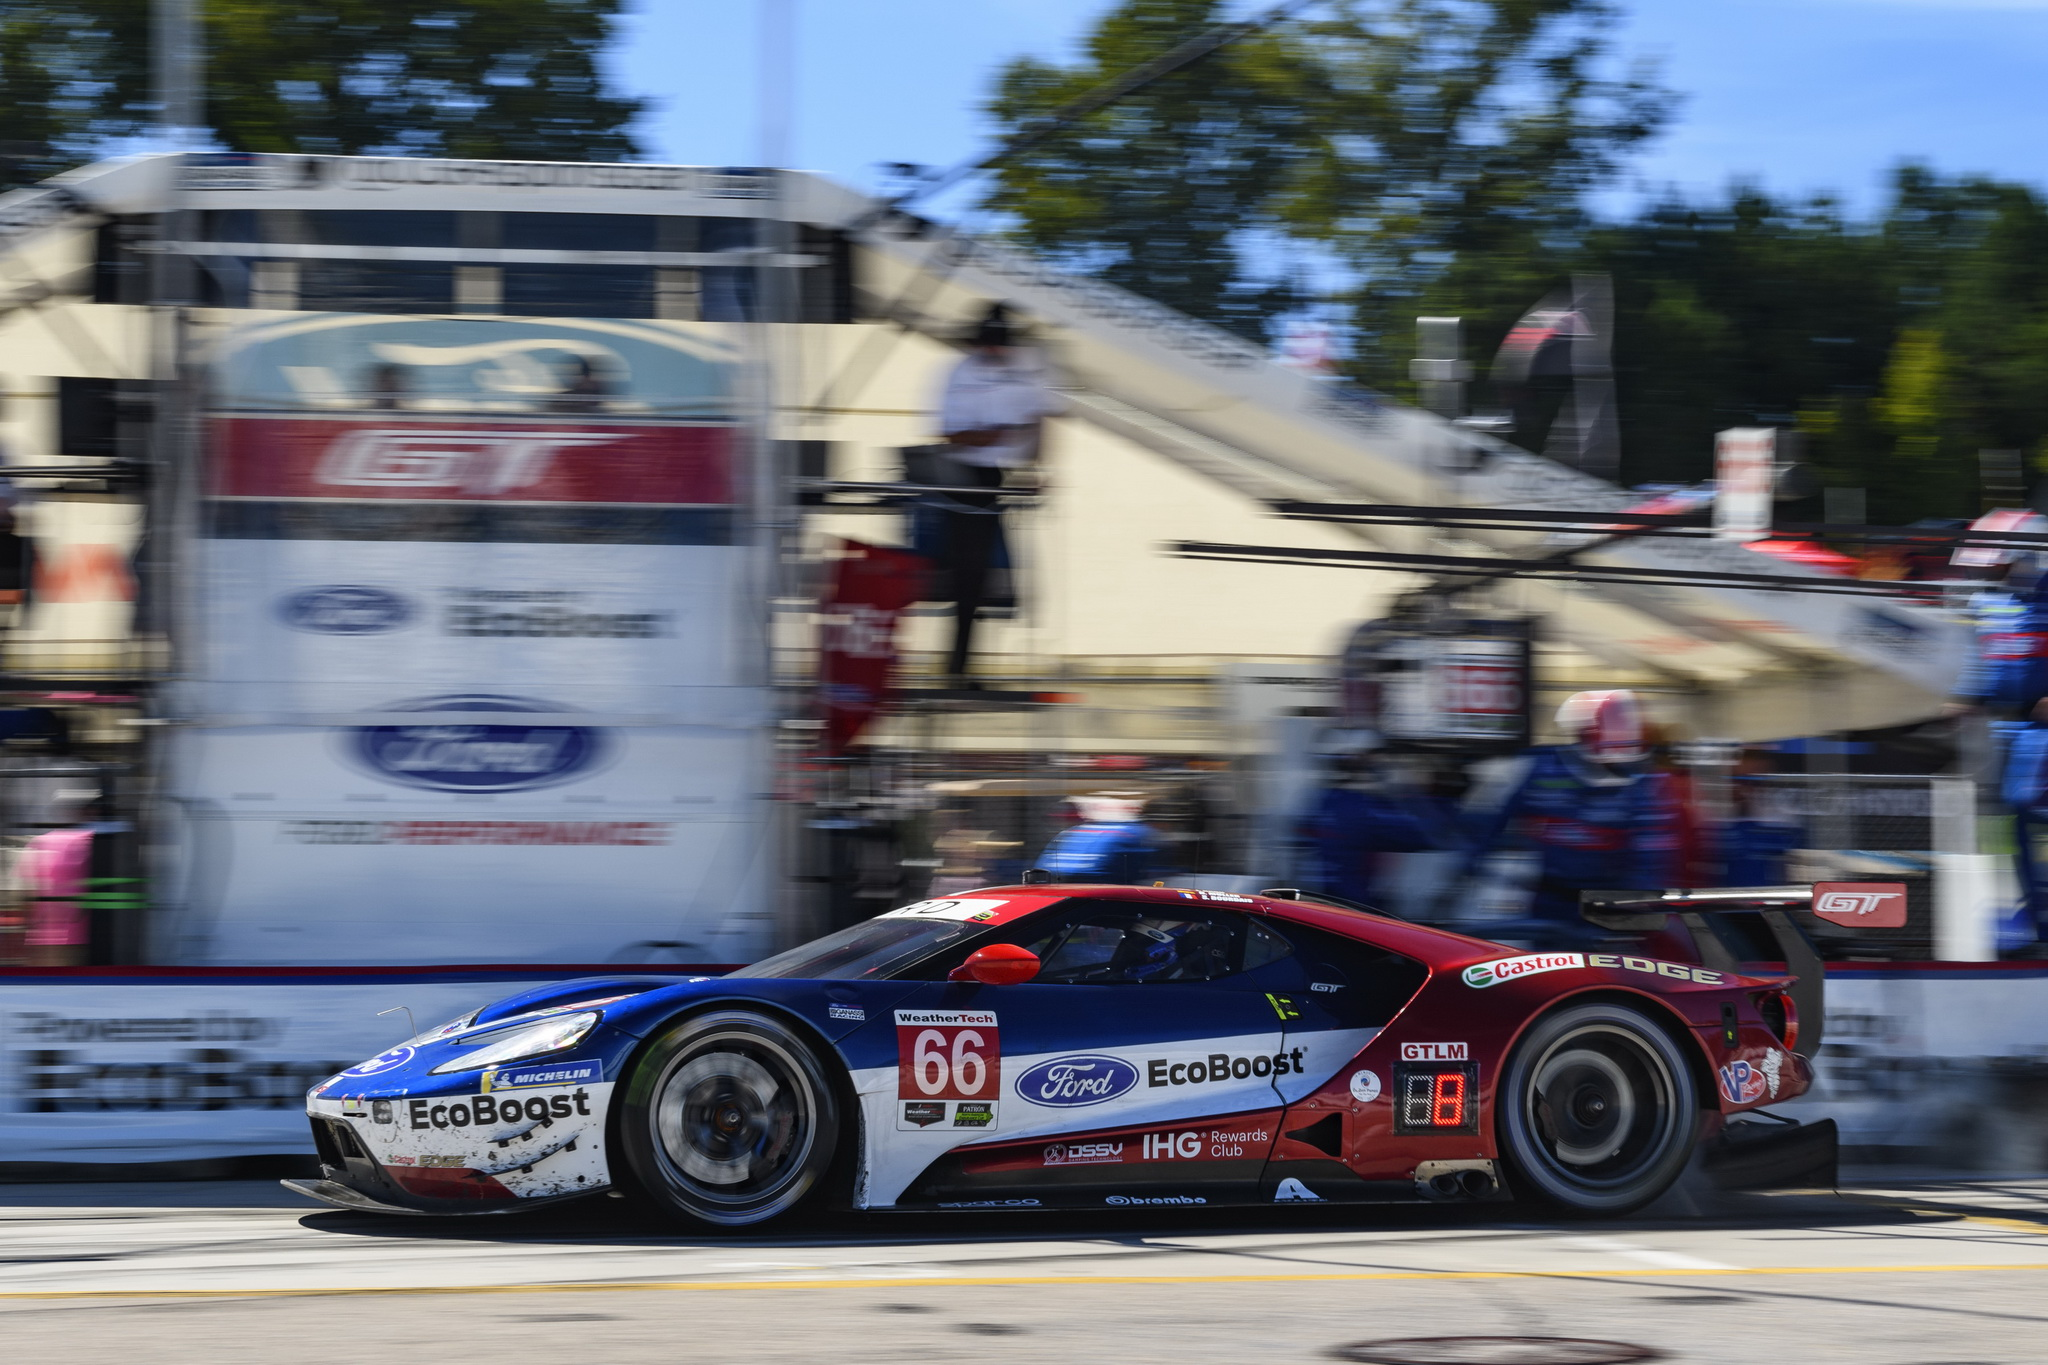 Ford Earns IMSA WeatherTech Manufacturer's Championship Title at 2018 Season Finale